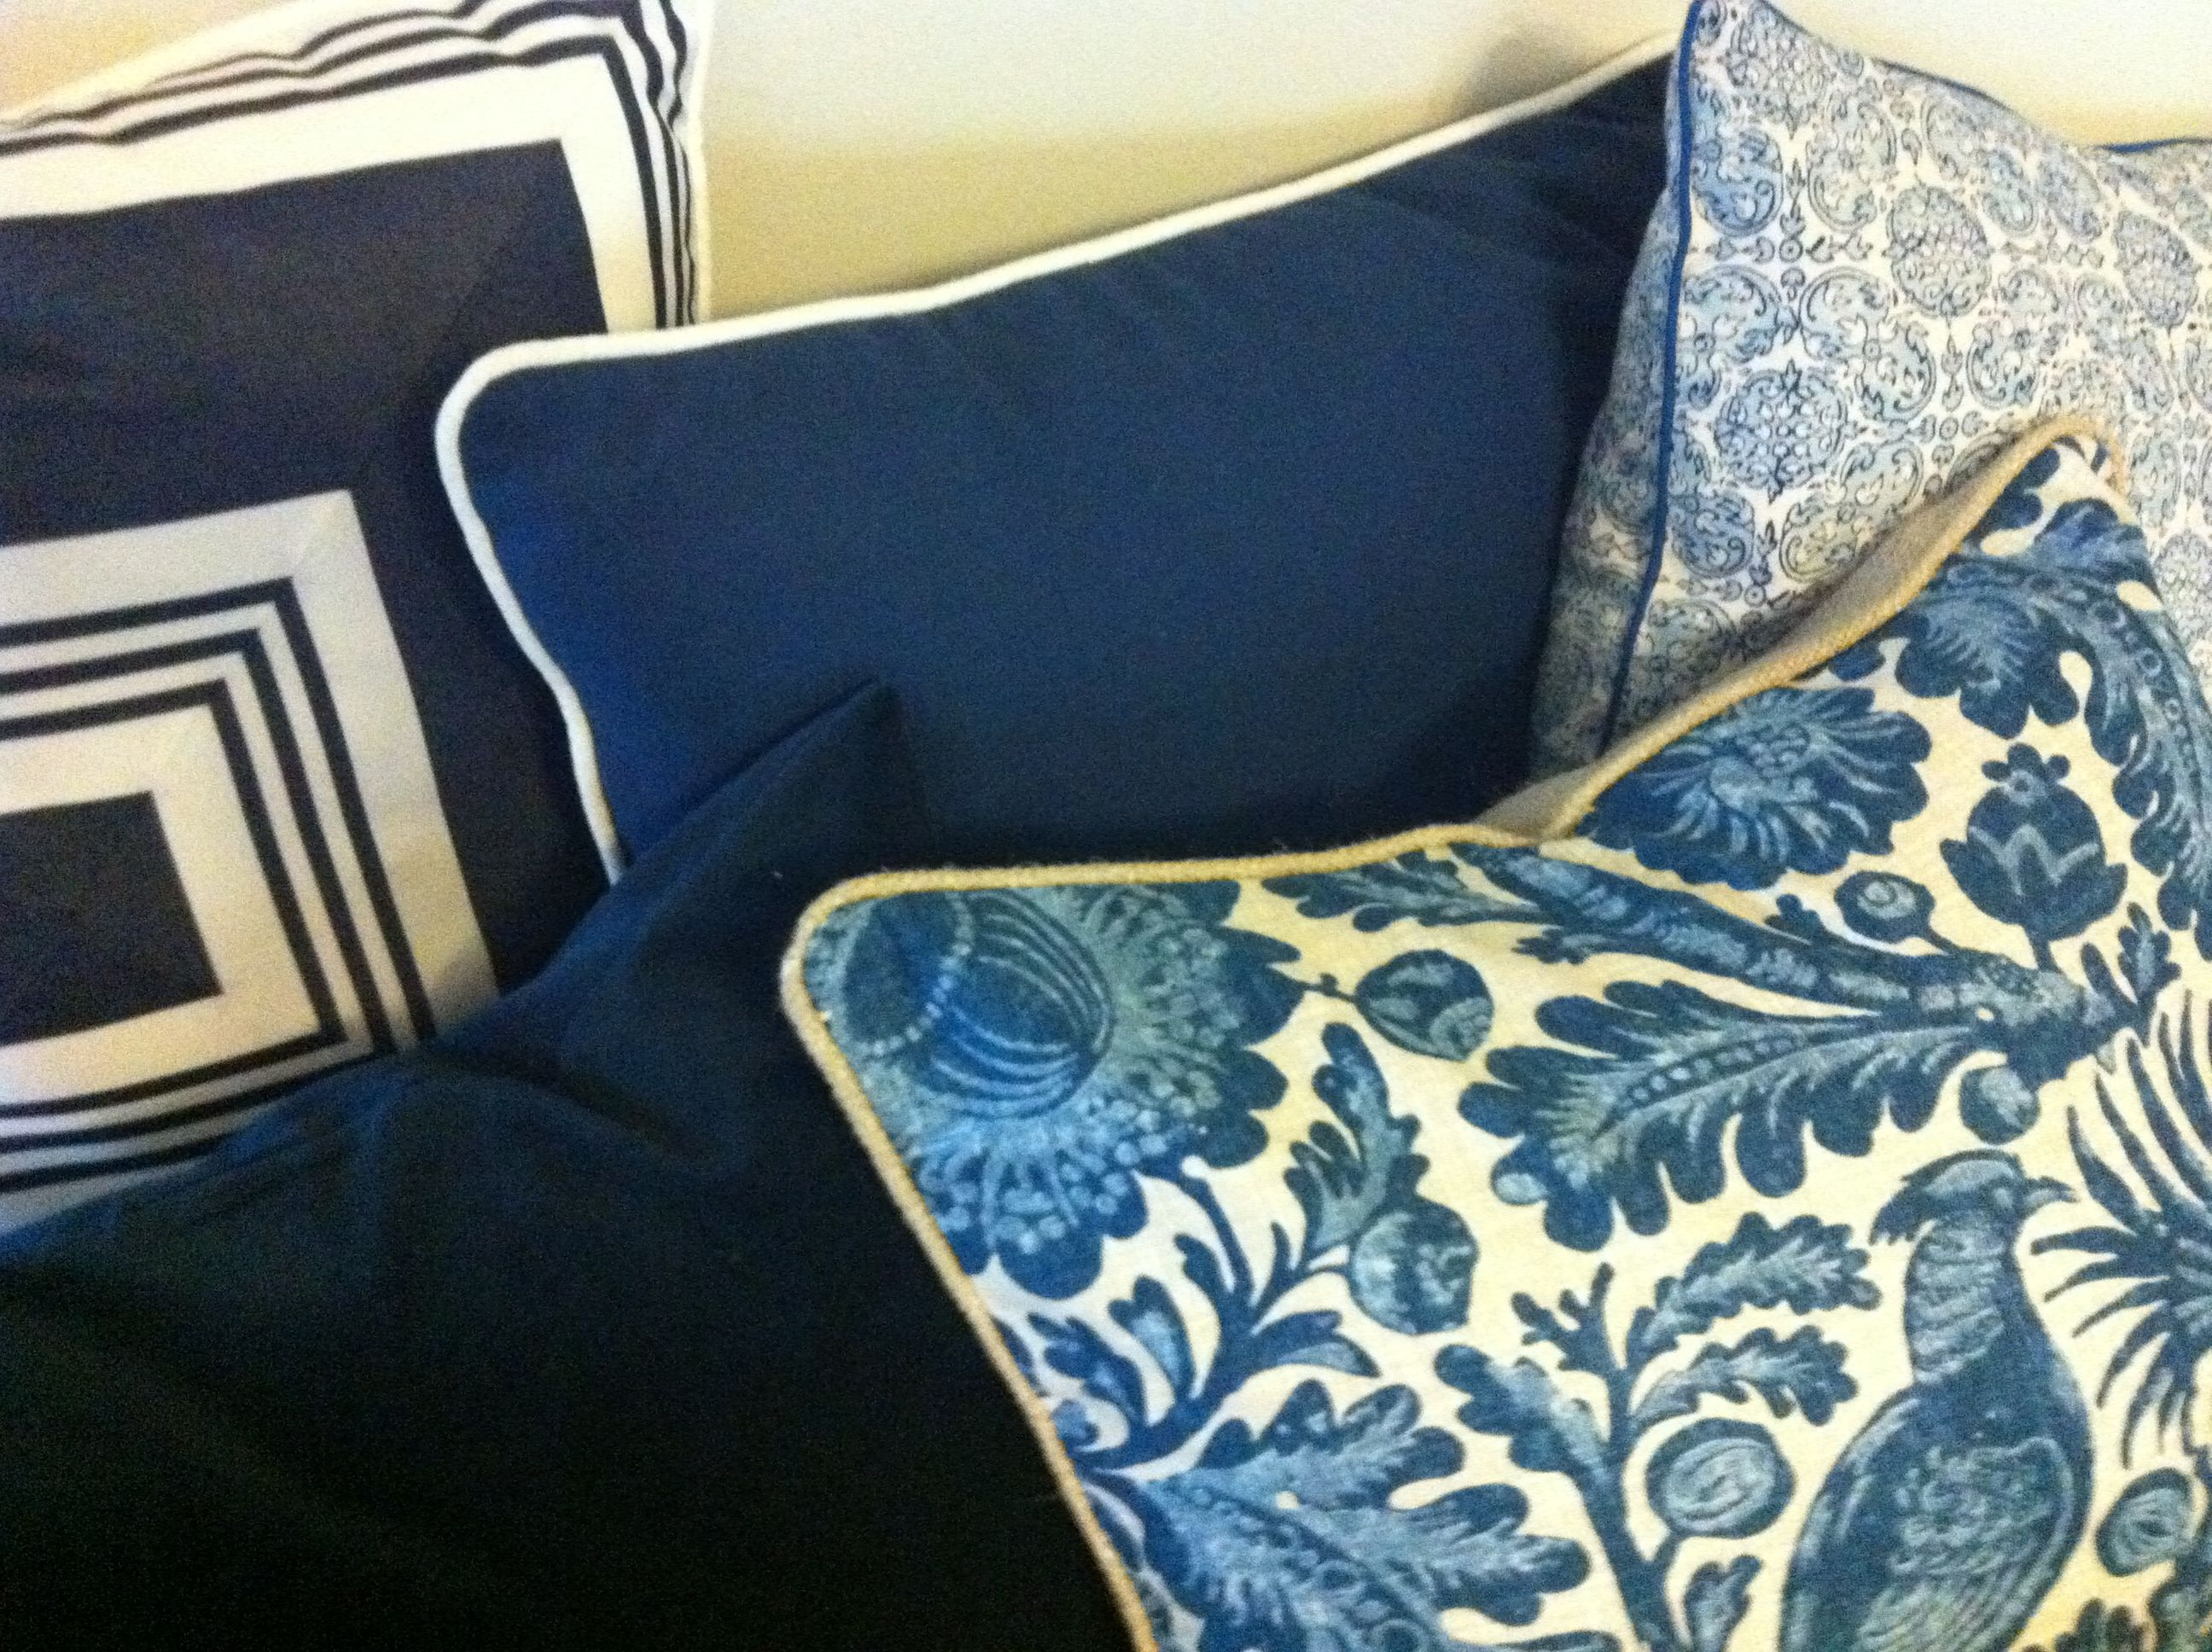 navy white natural linen cushions in Ralph Lauren and Kravet